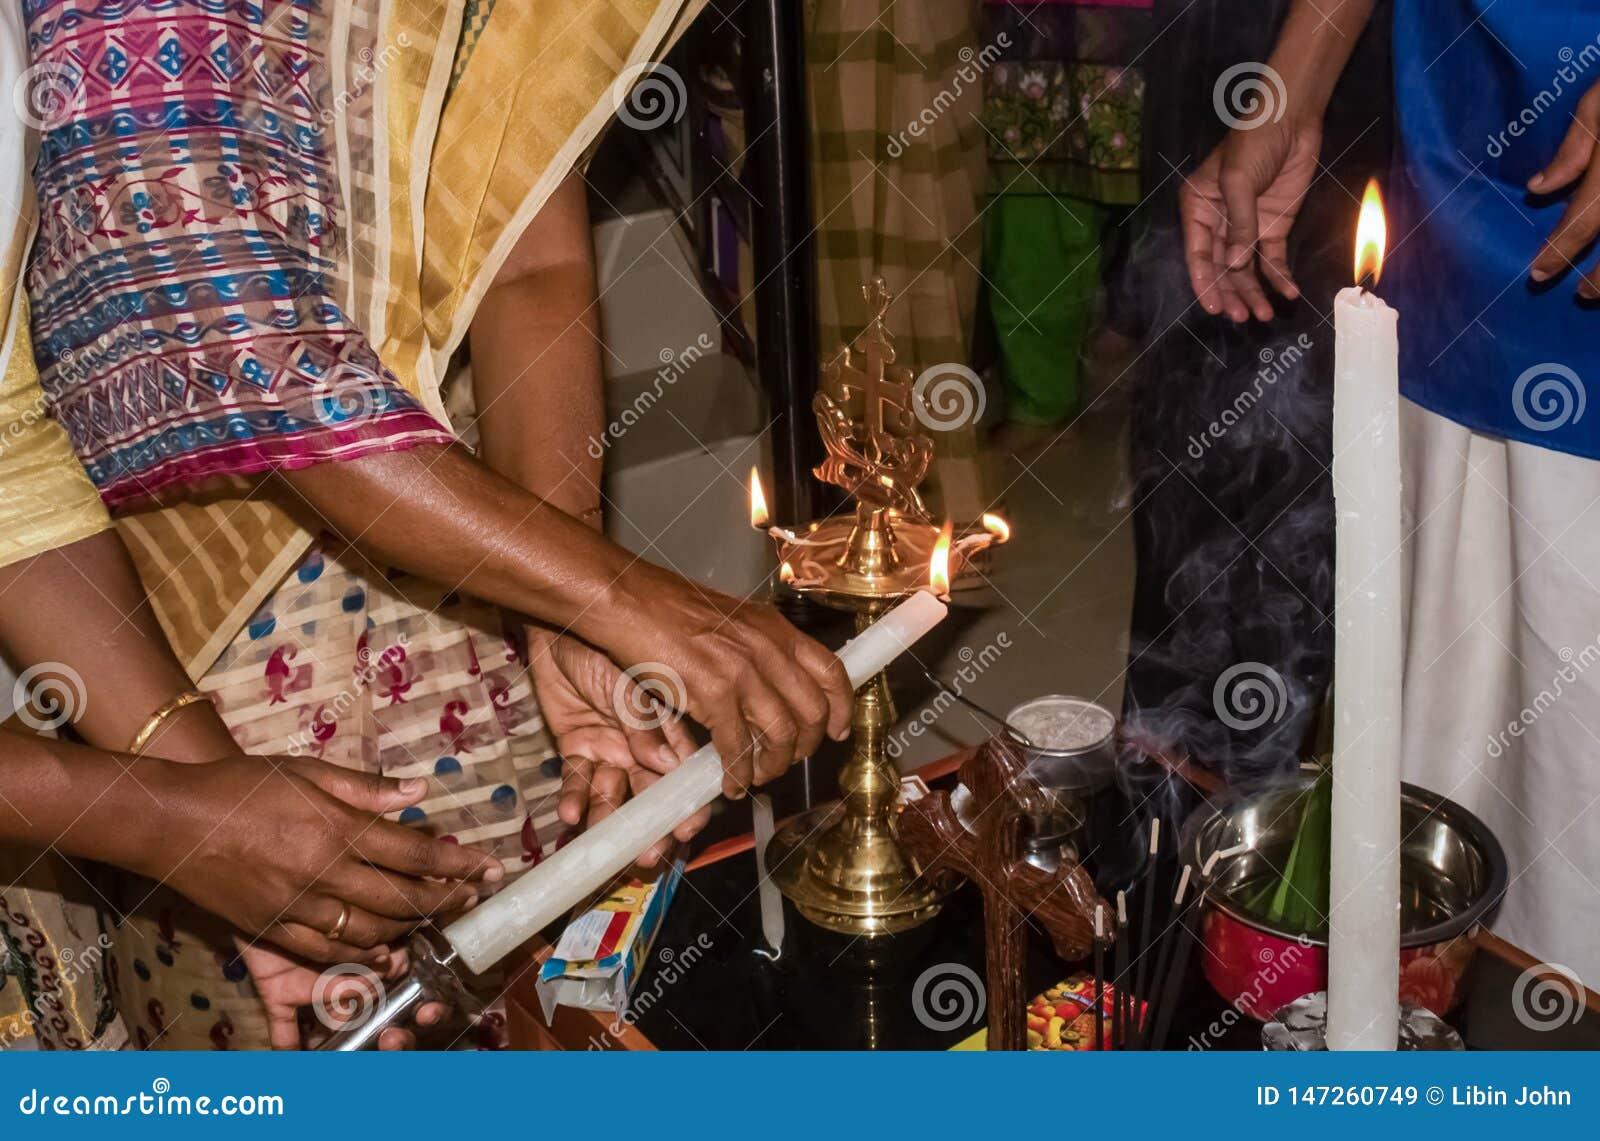 House warming rituals in Kerala Malankara Orthodox church - Lighting up Nilavilakku with candle